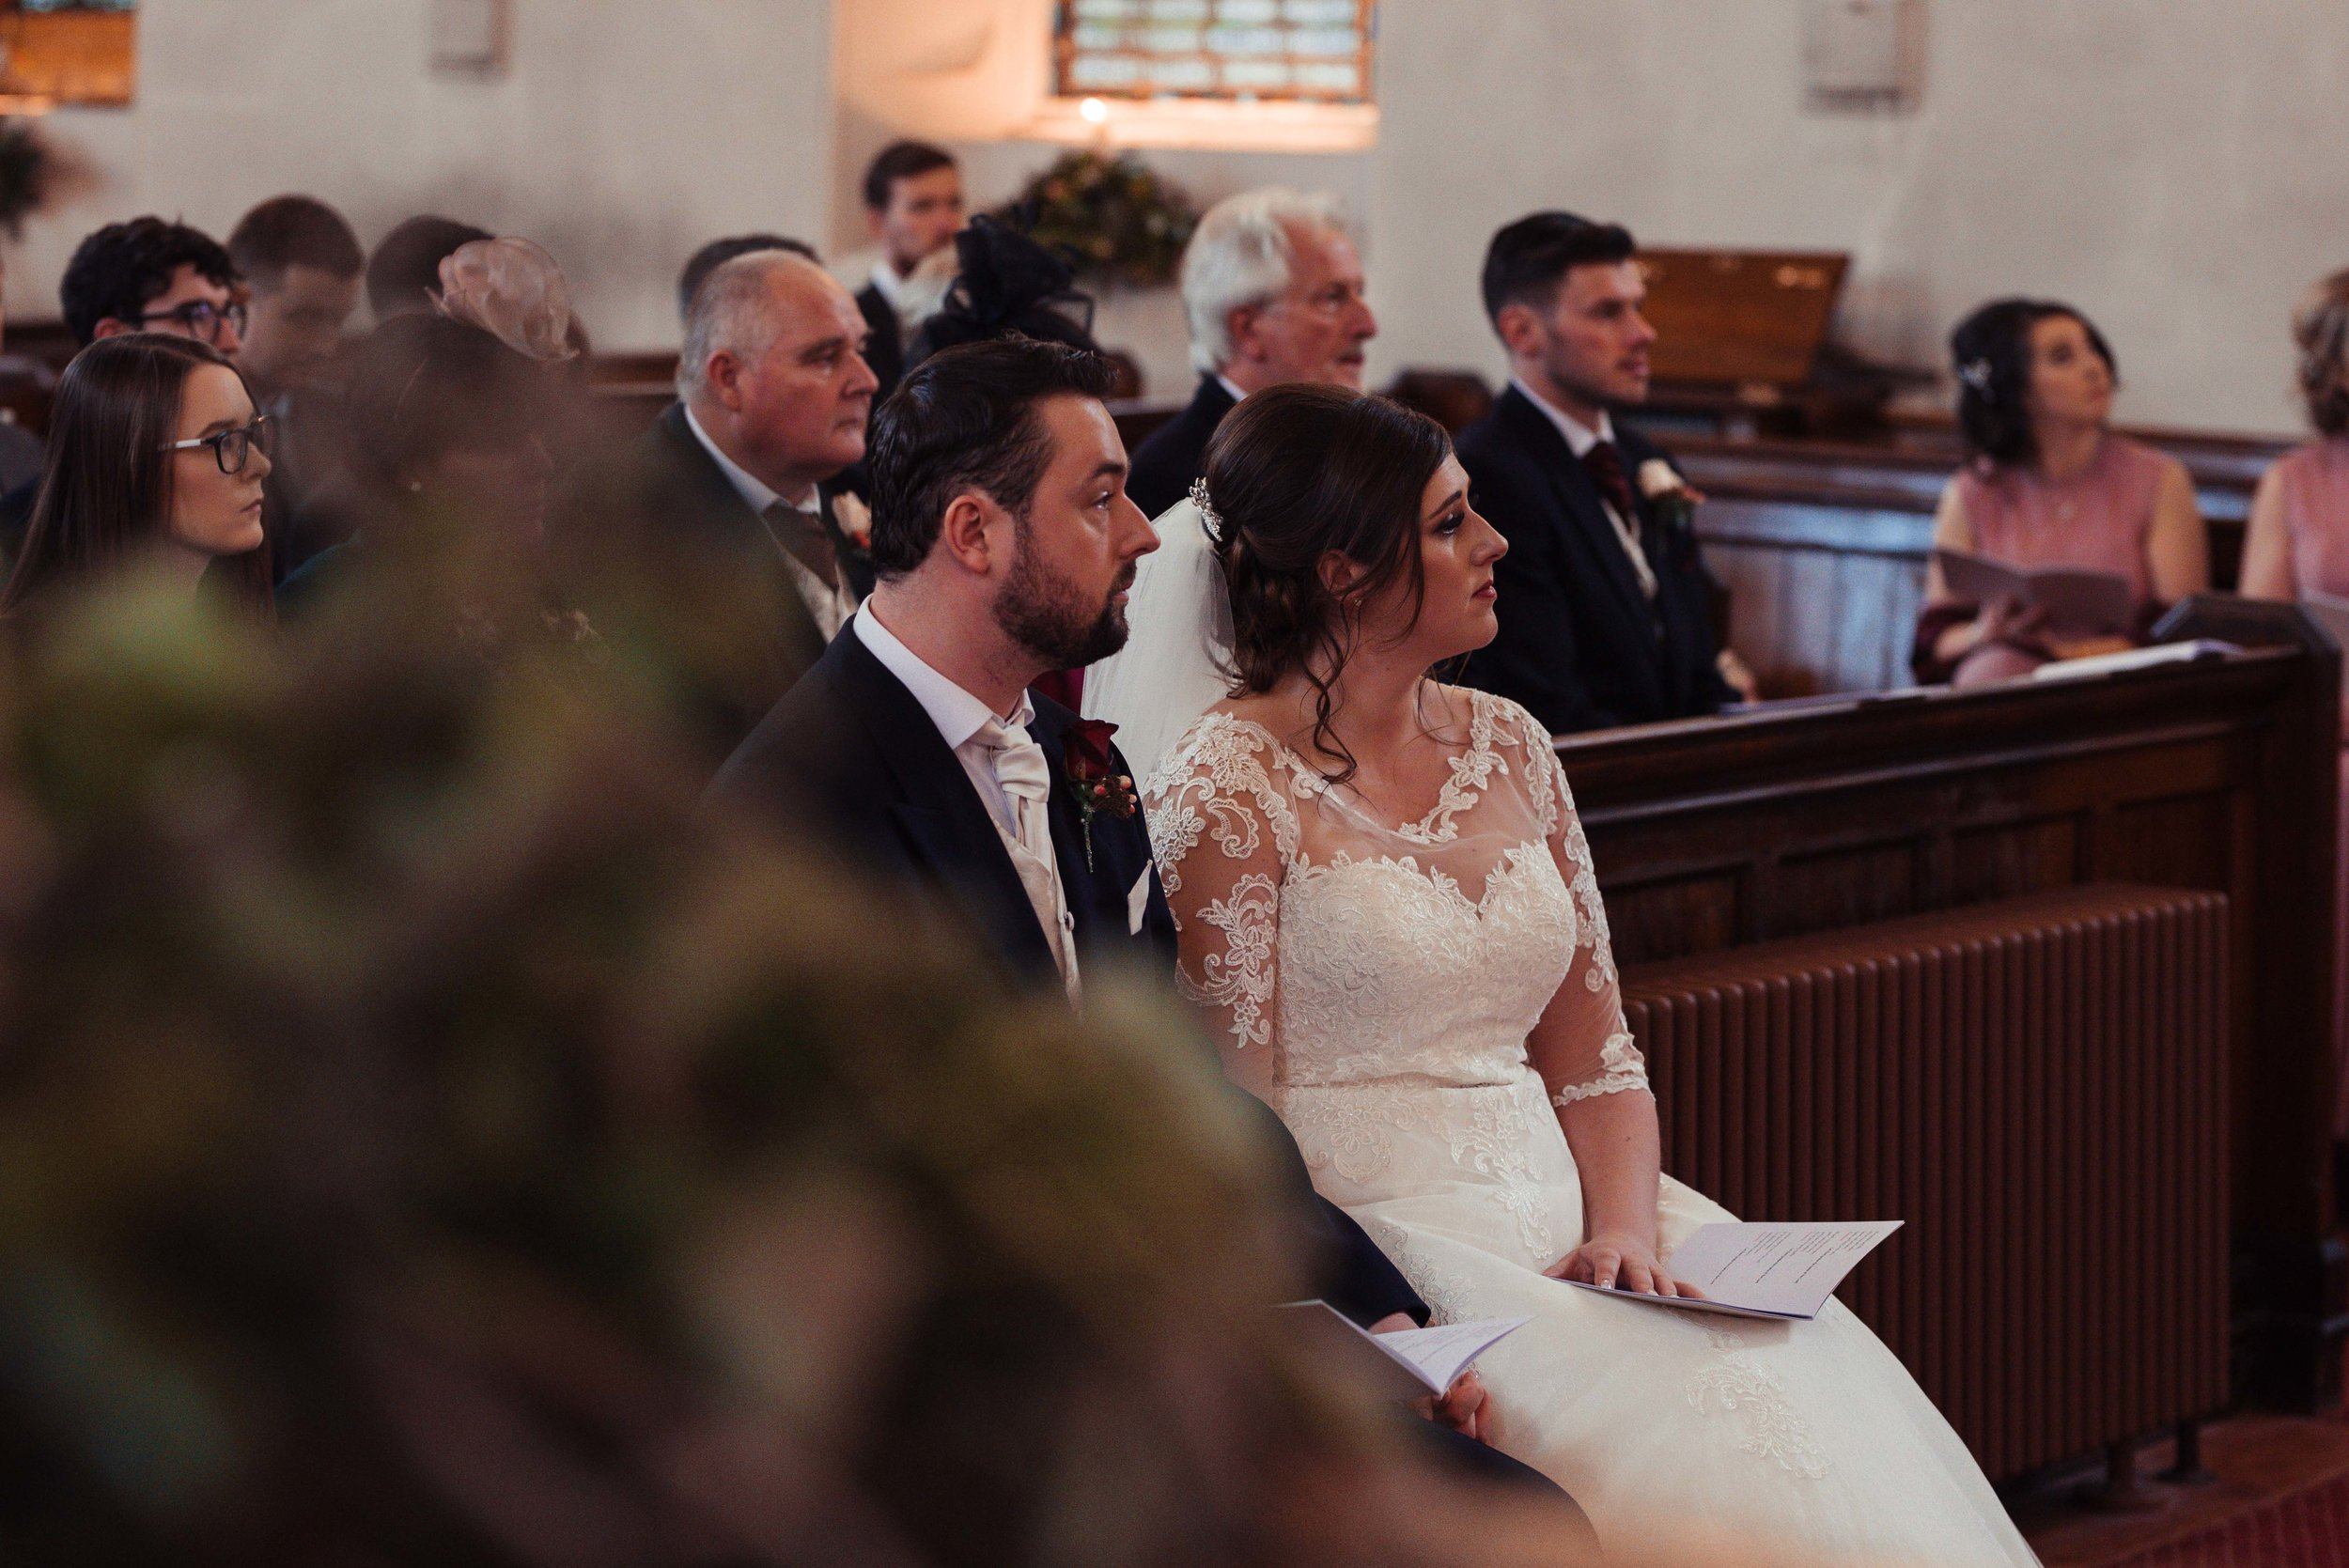 Belsfield-wedding-photography-14.jpg